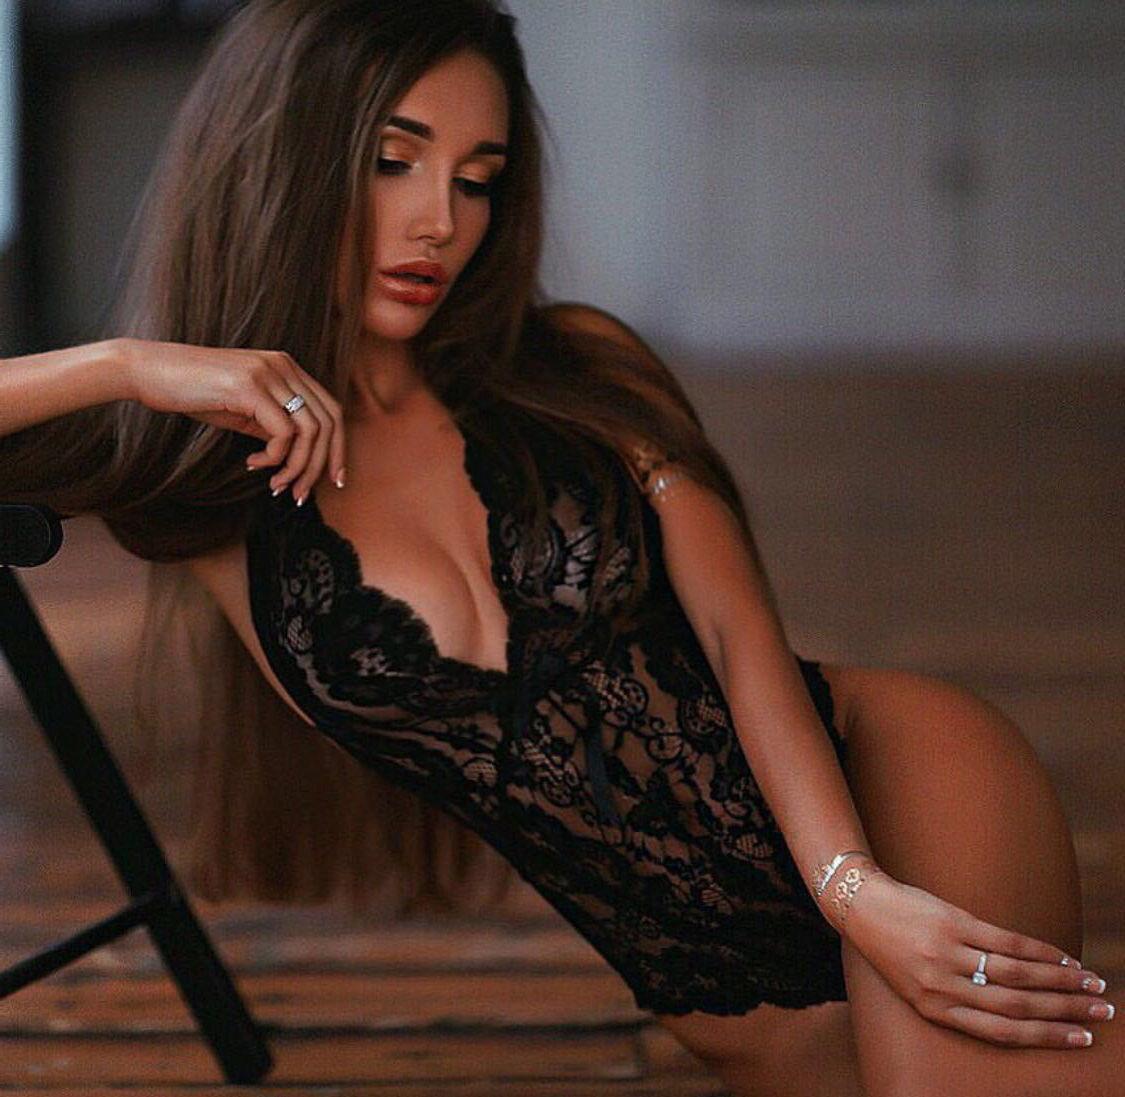 escort vaasa sexy striptease videos